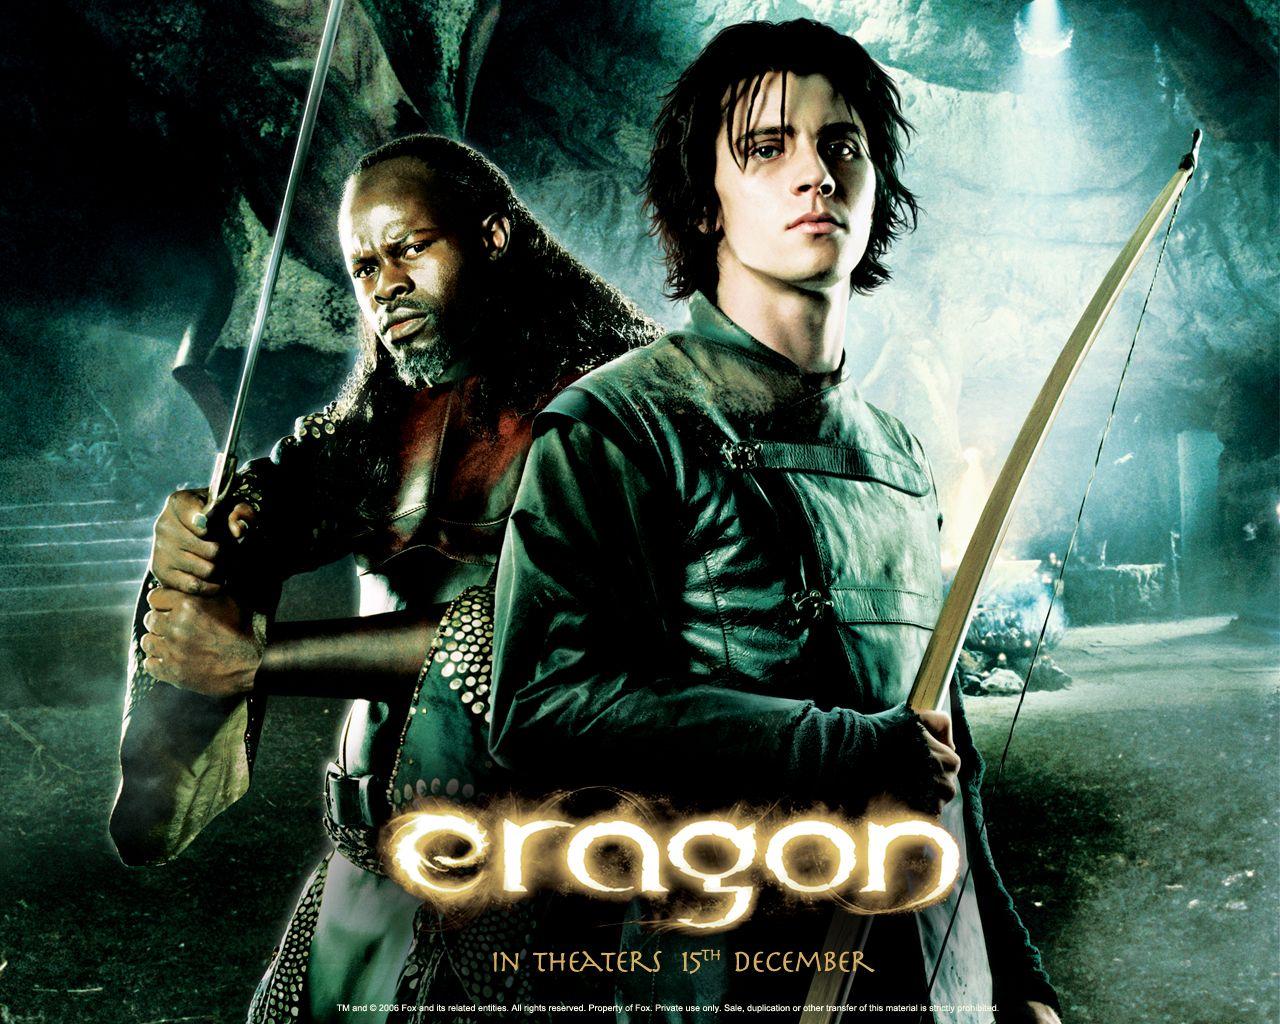 Garrett Hedlund - Murtagh   Eragon movie, Eragon, Eragon ...